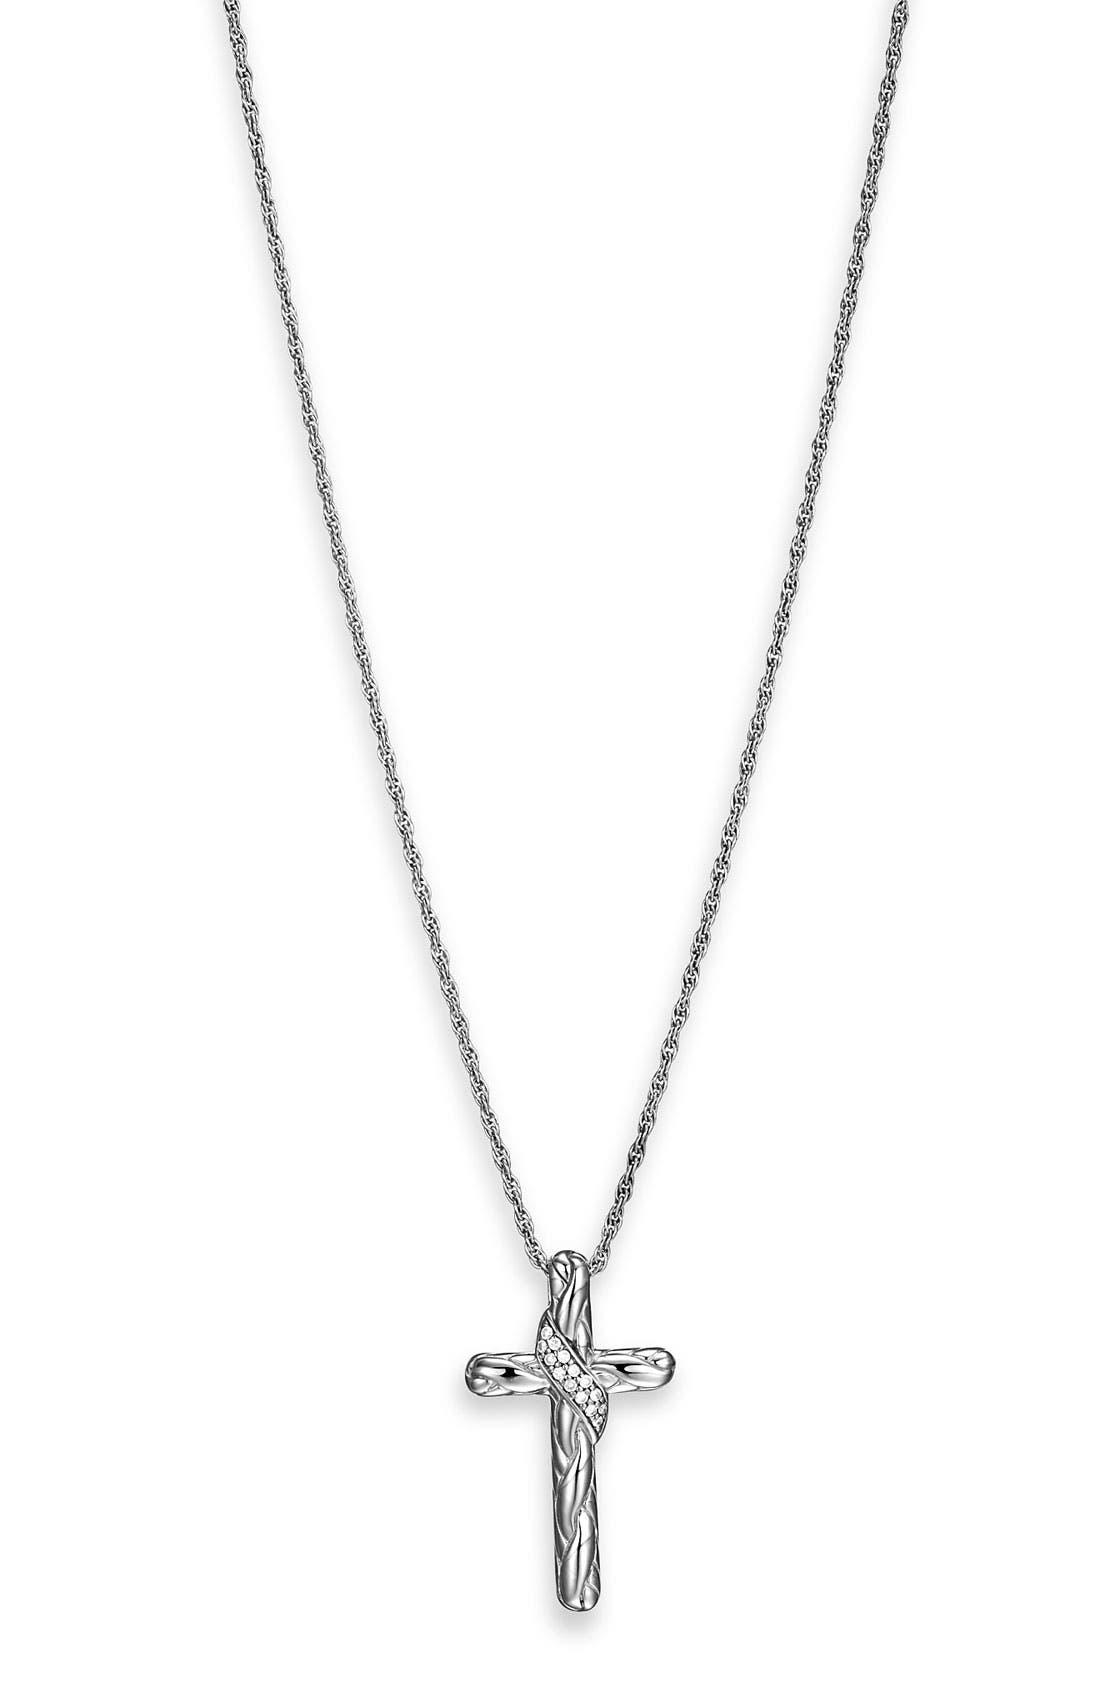 Alternate Image 1 Selected - John Hardy 'Classic Chain Kepang' Small Diamond Cross Pendant Necklace